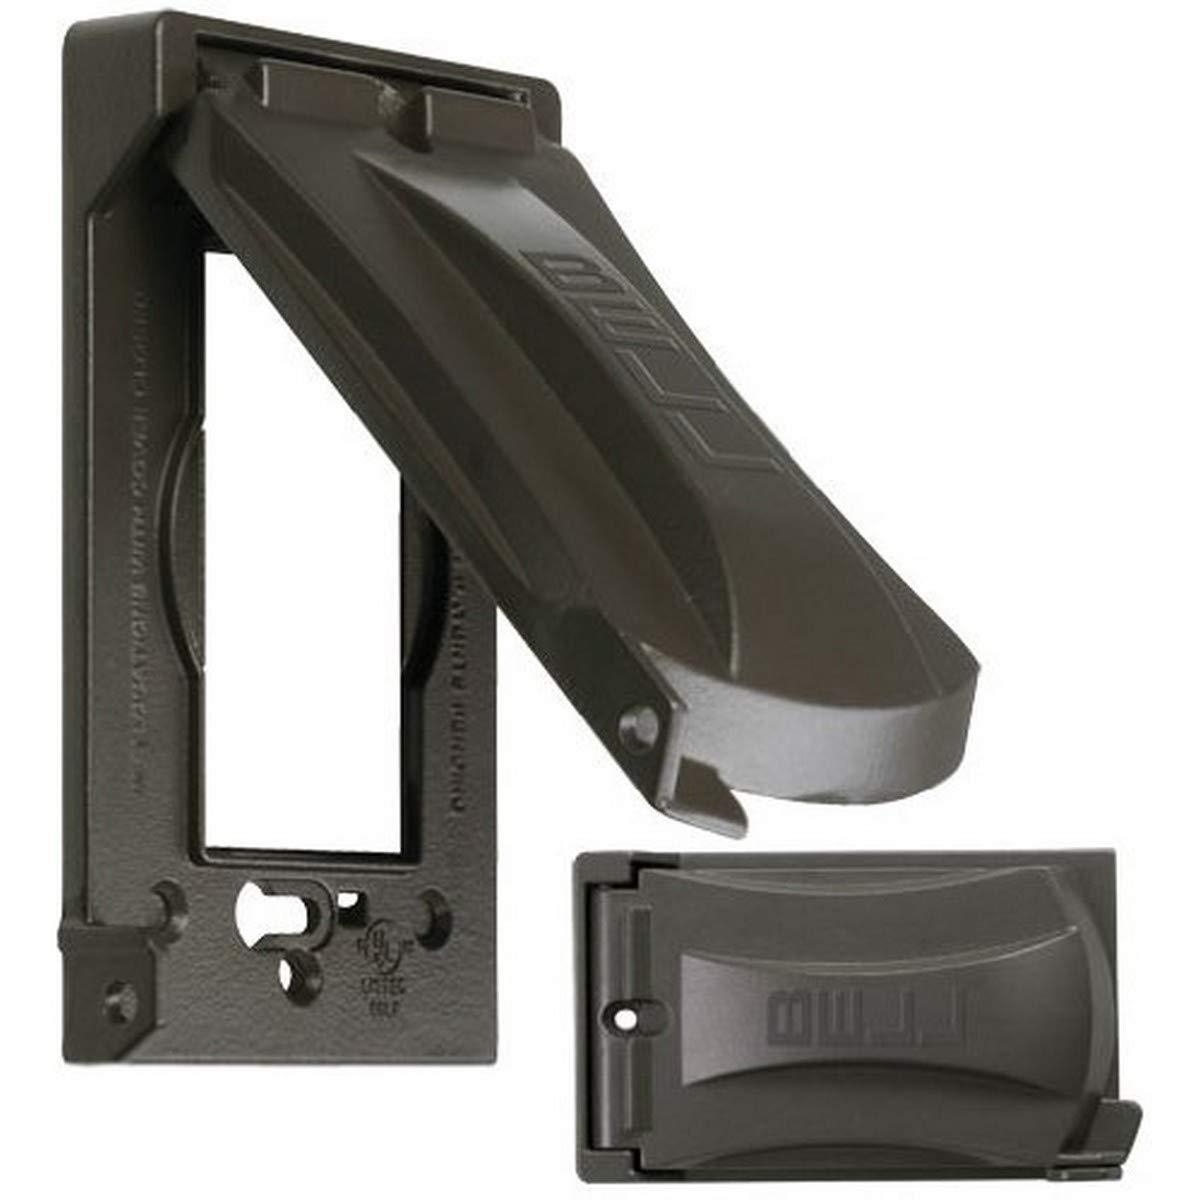 Hubbell-Bell MX1050Z Single-Gang Vertical/Horizontal Weatherproof Universal Flip Cover, Bronze